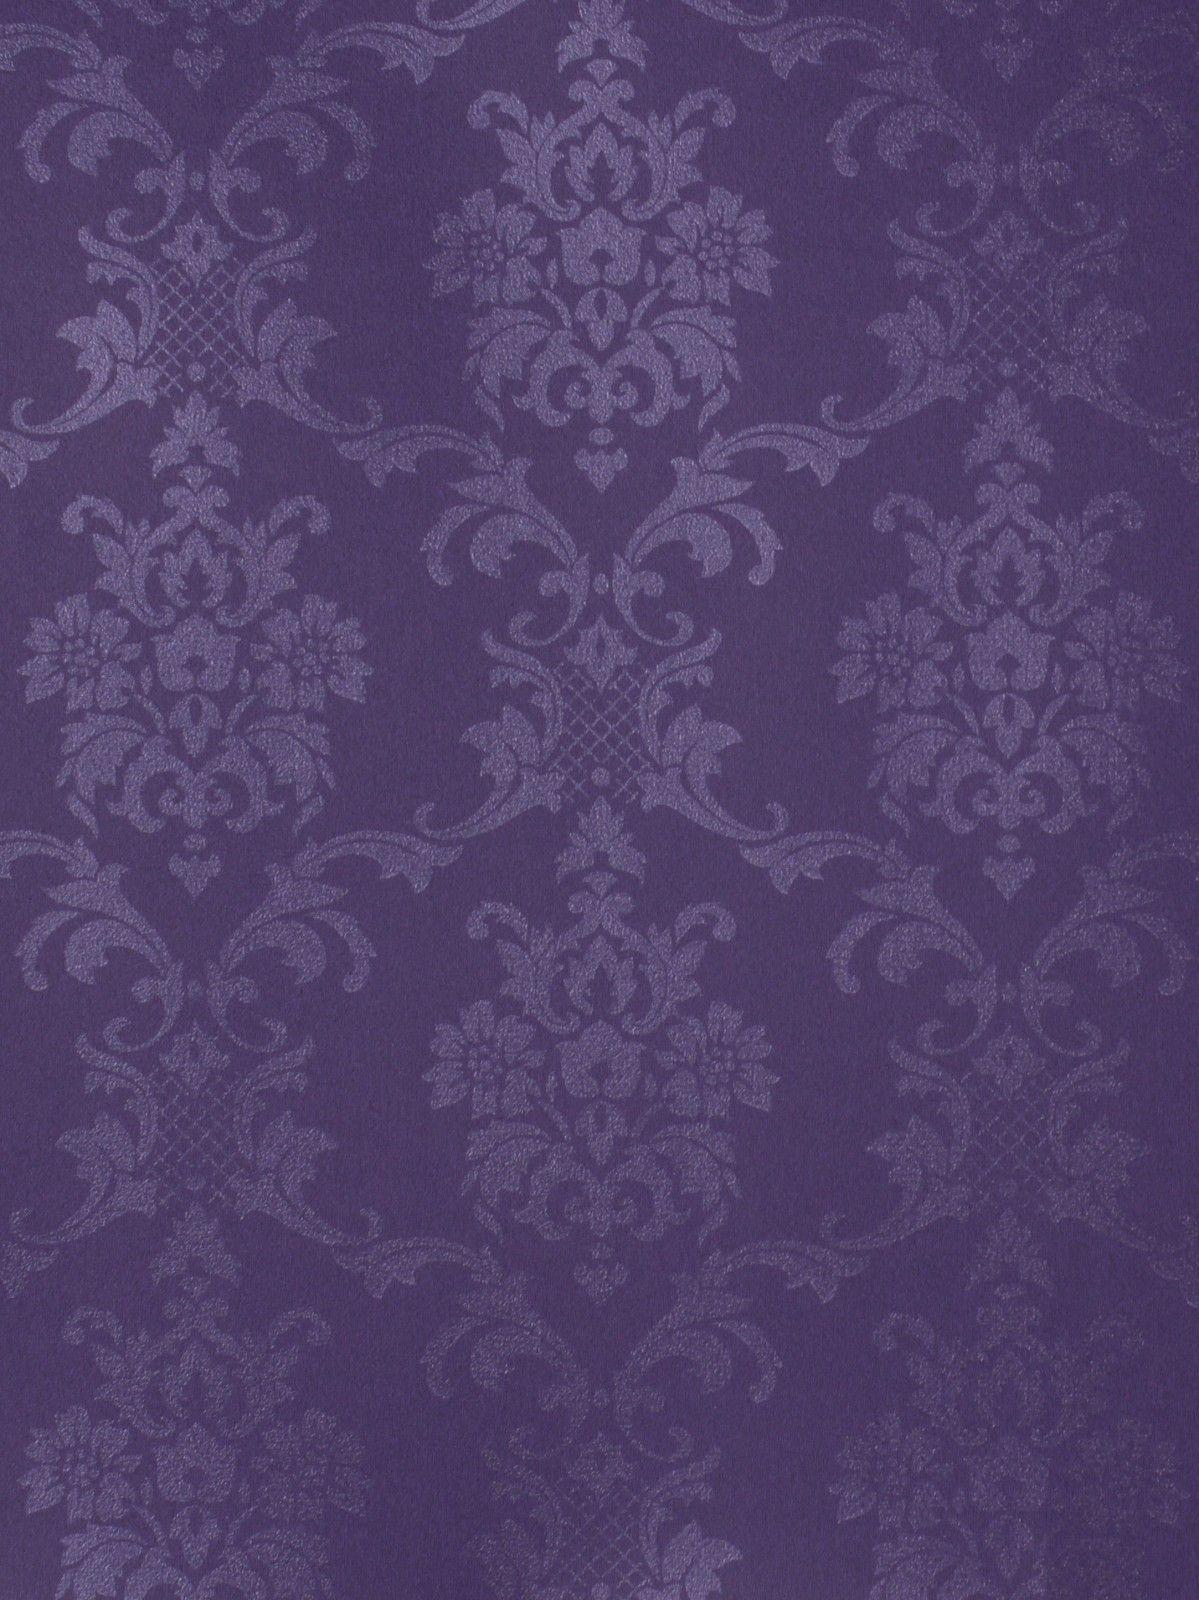 Vliestapete Rasch Textil Barock lila Love